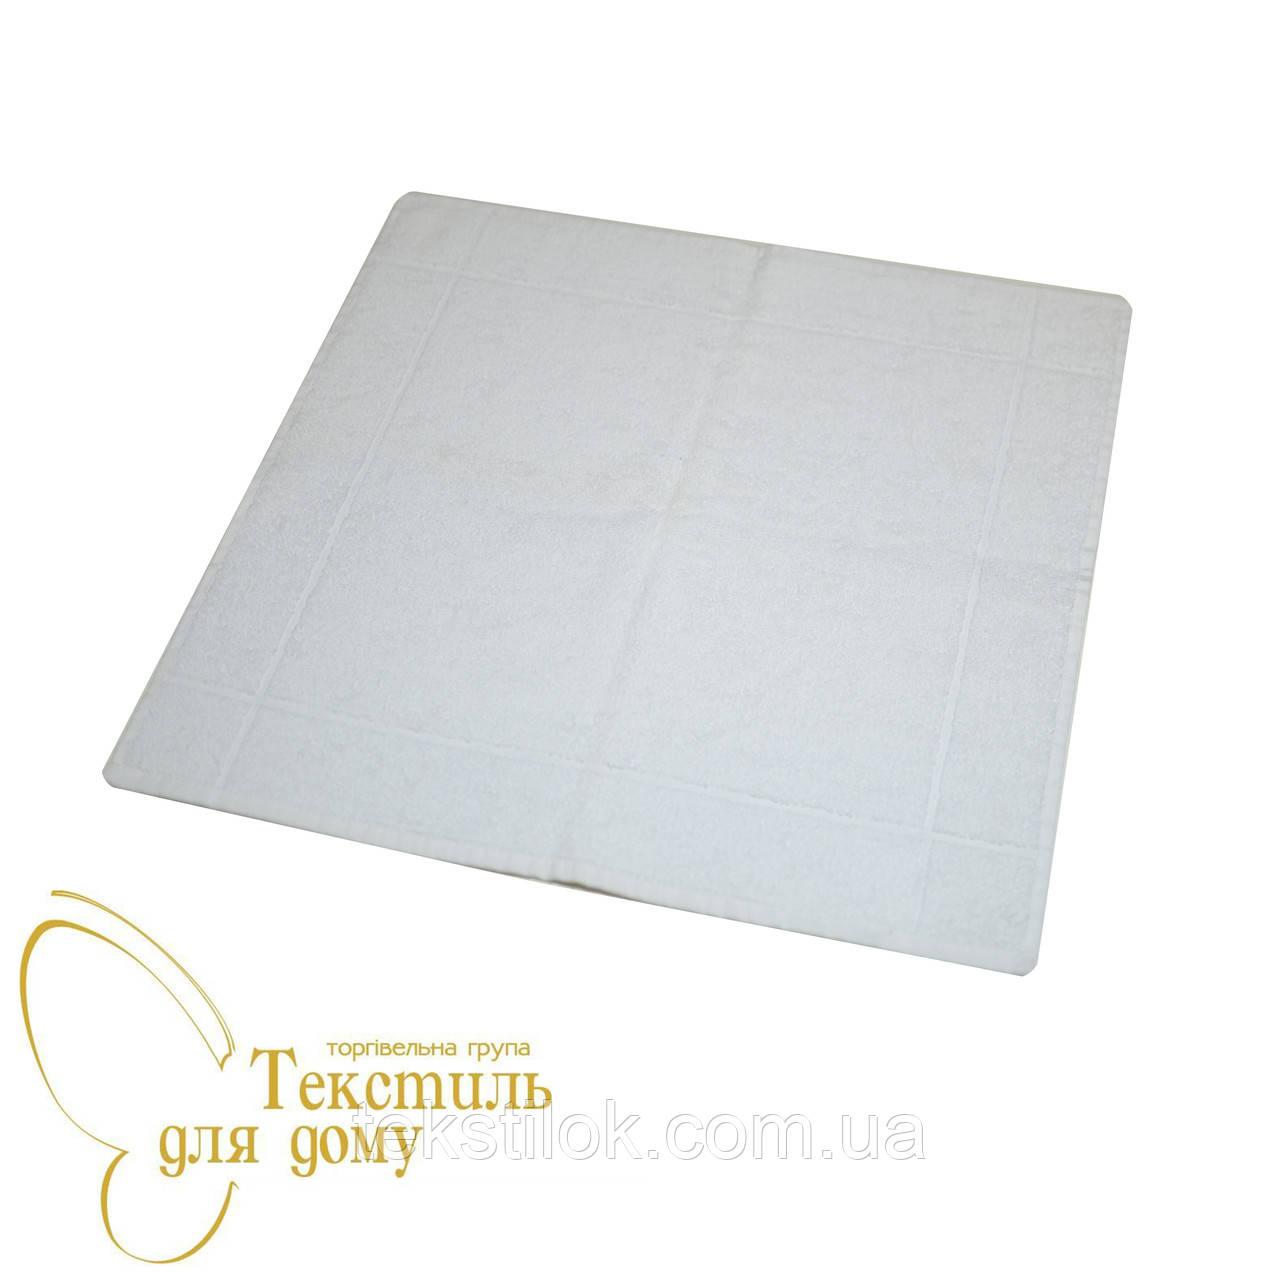 Кухонное полотенце махра 50*50 ассорти, белый